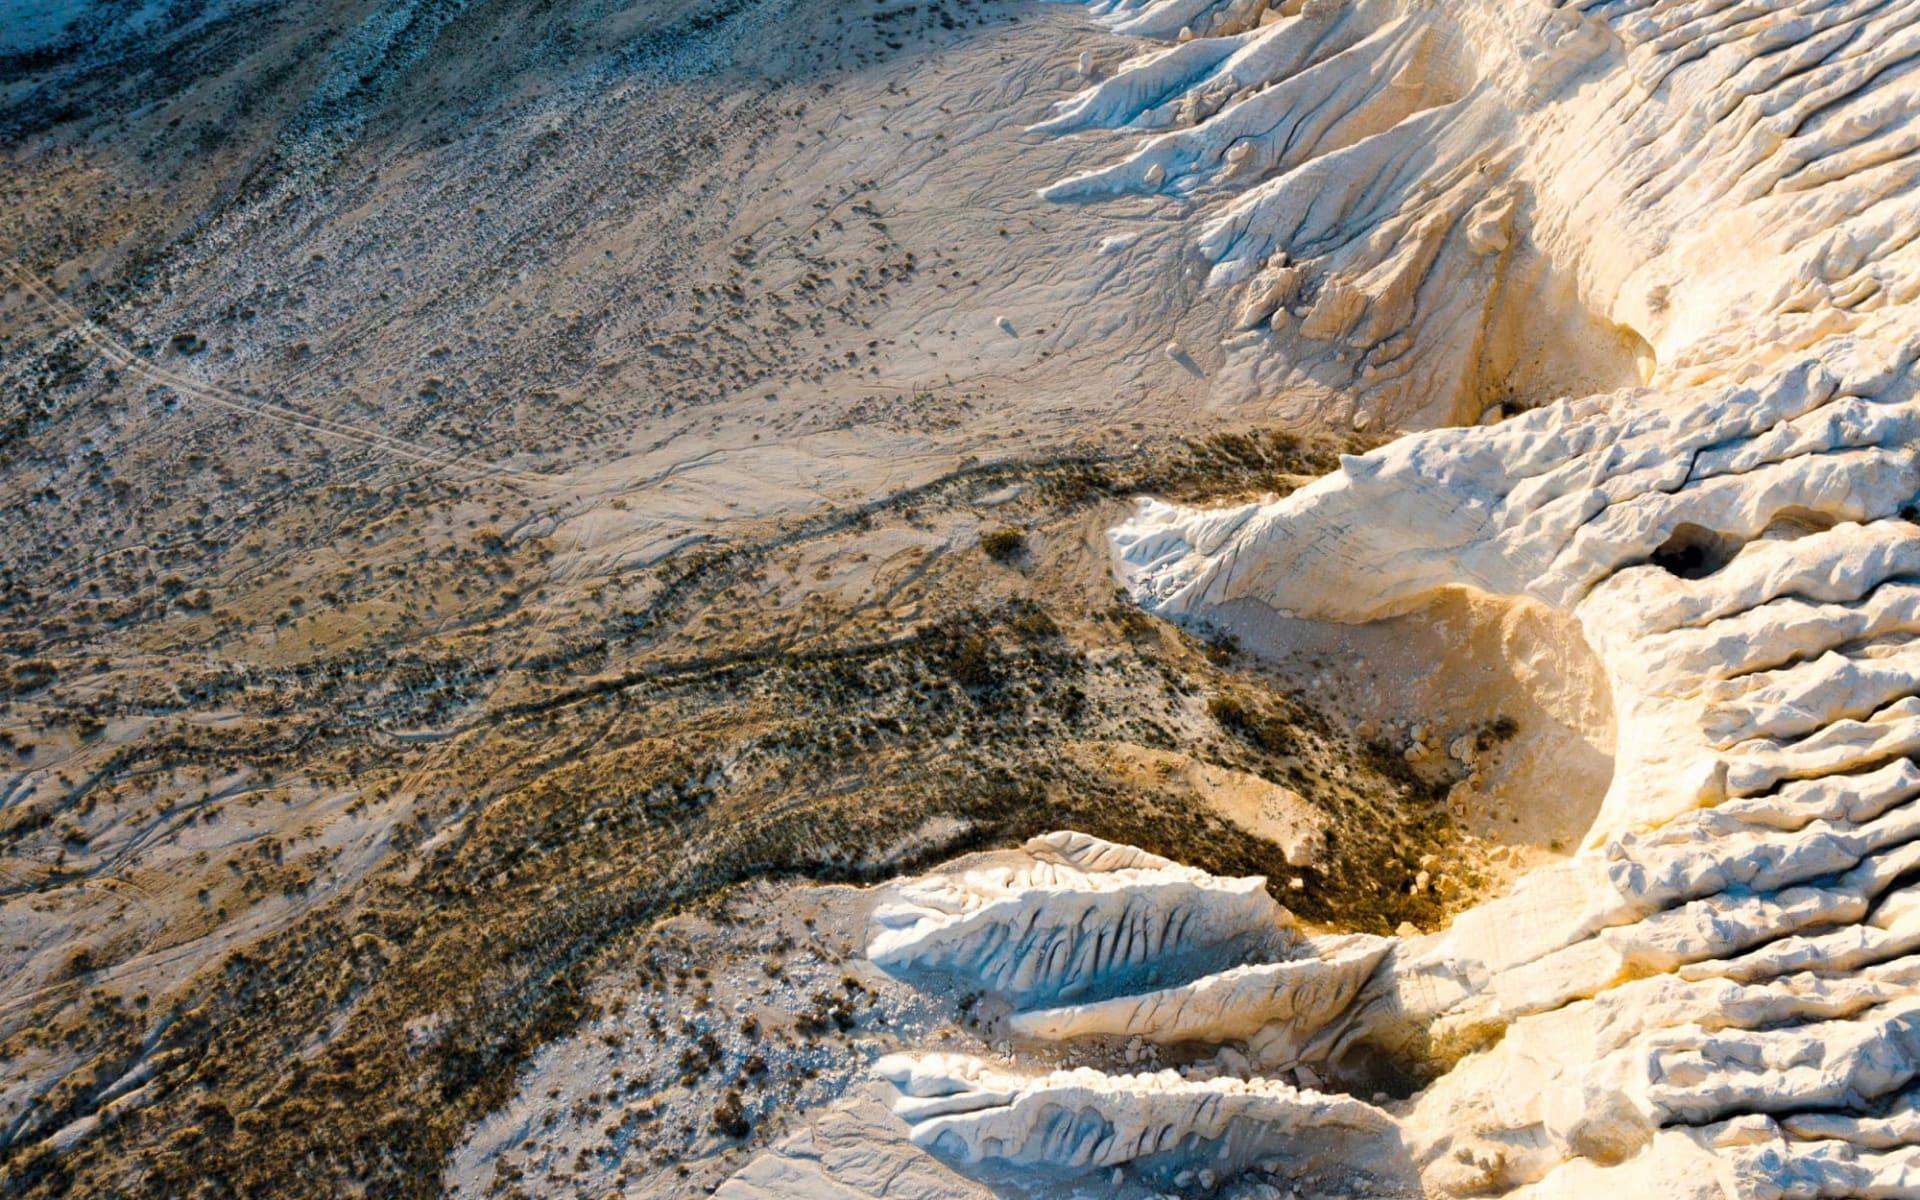 Einmalige Salz-Landschaft im Westen Kasachstans ab Aktau: KA_Tuzbair_shutterstock_1468276658_Boris Rezvantsev